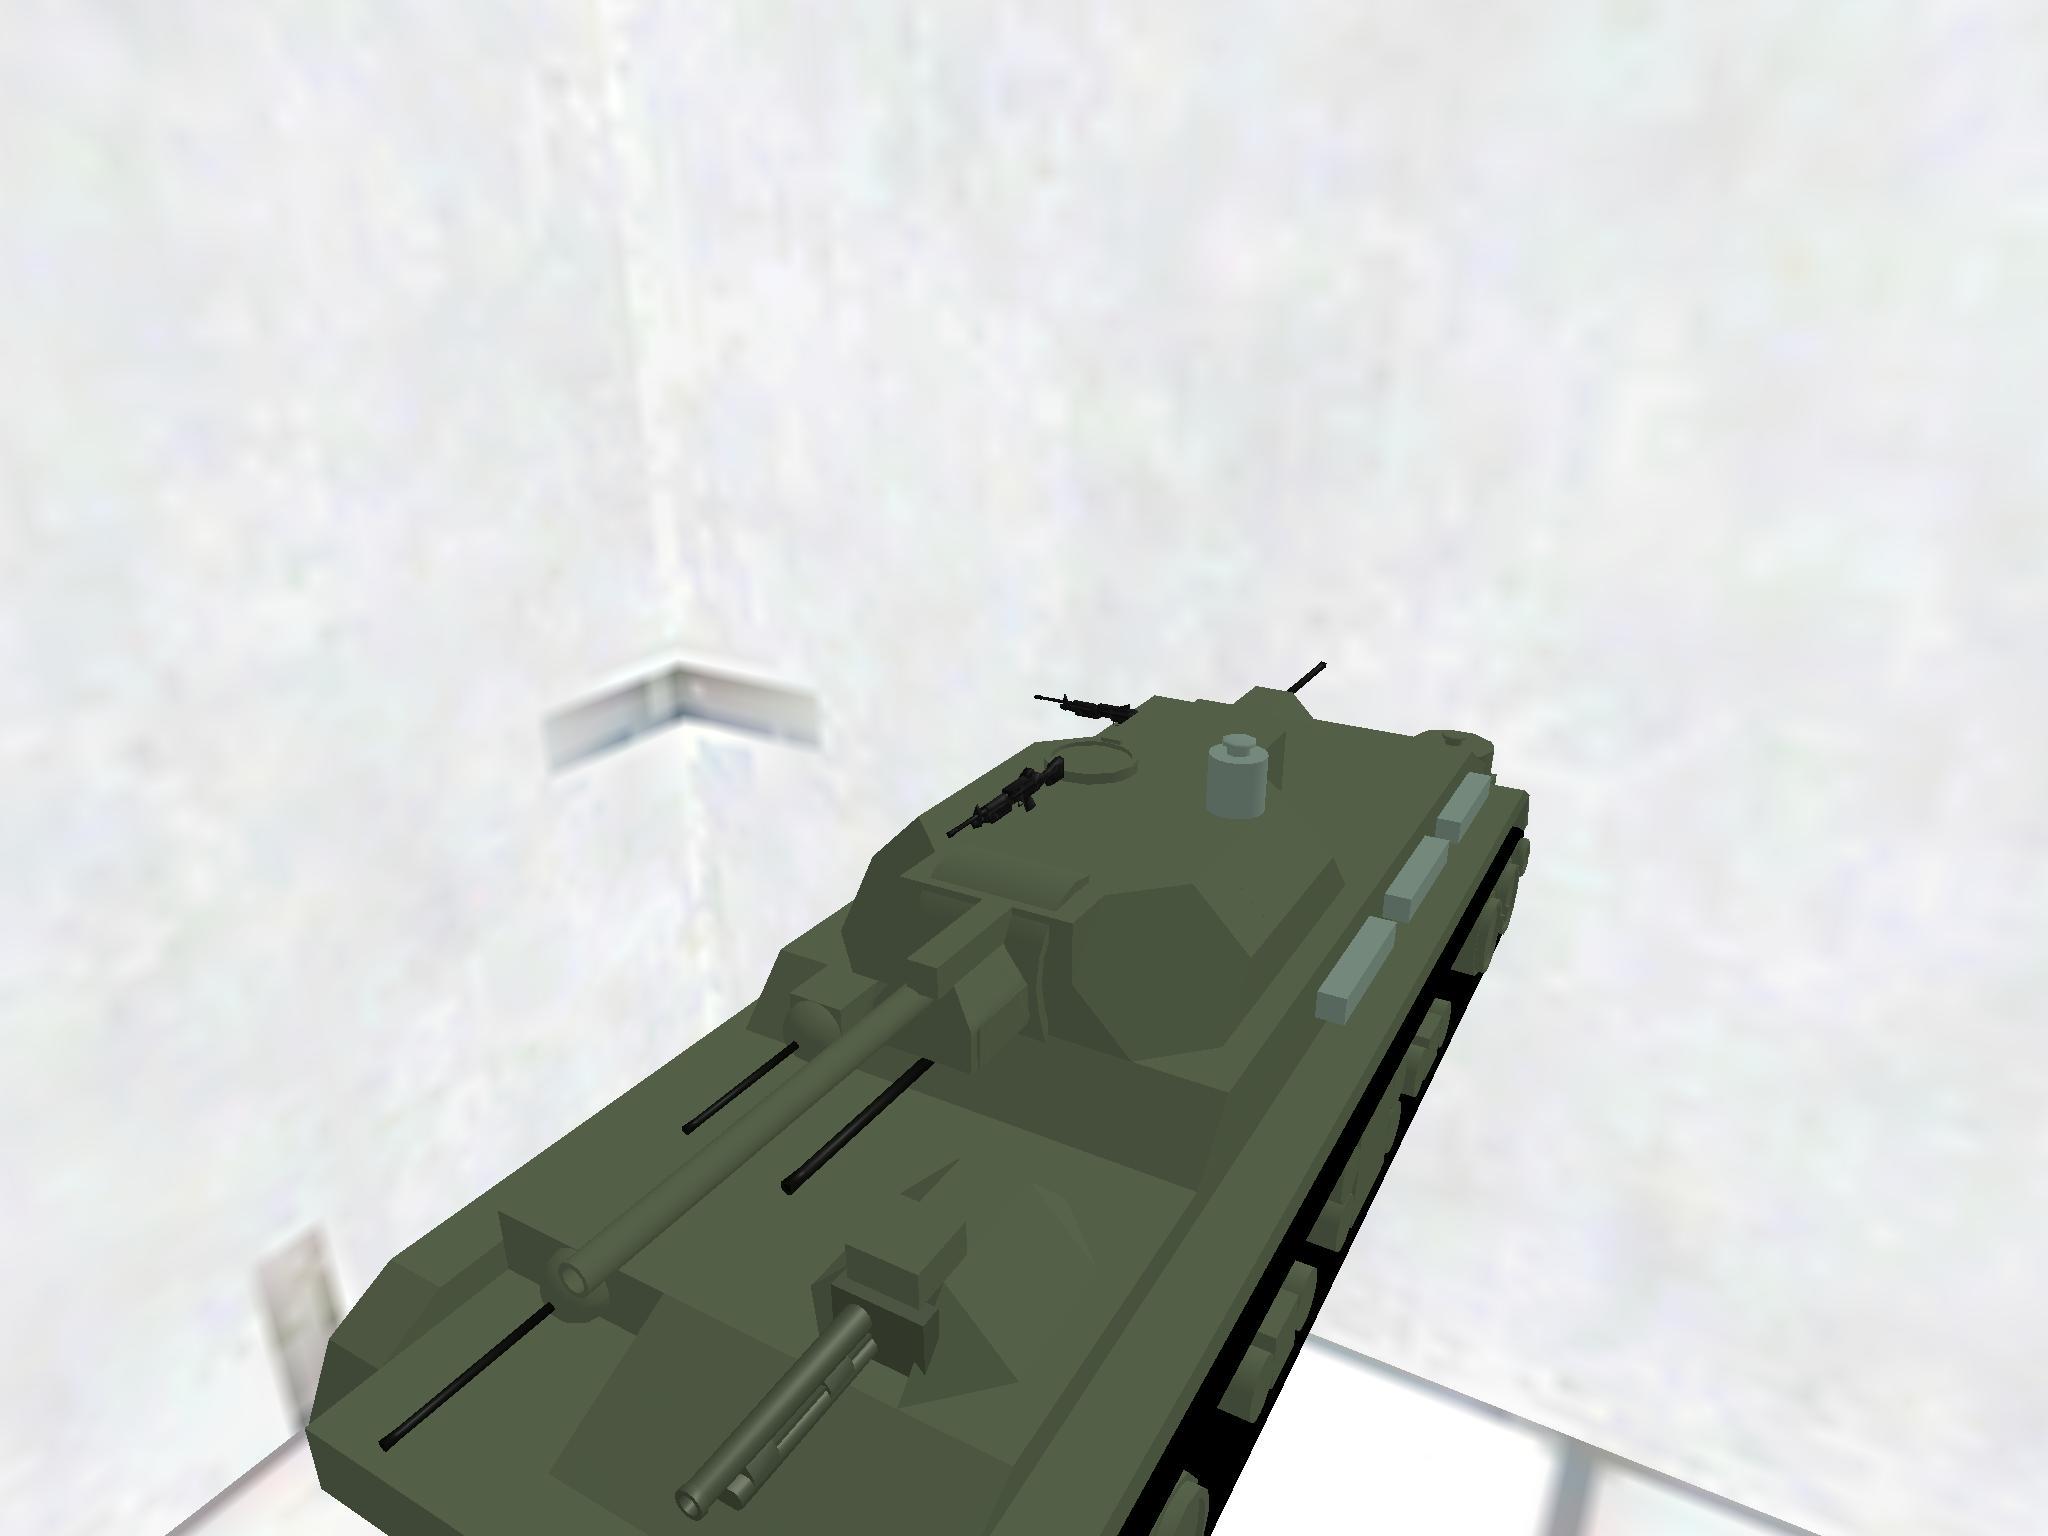 Turtle tank (final edit!)